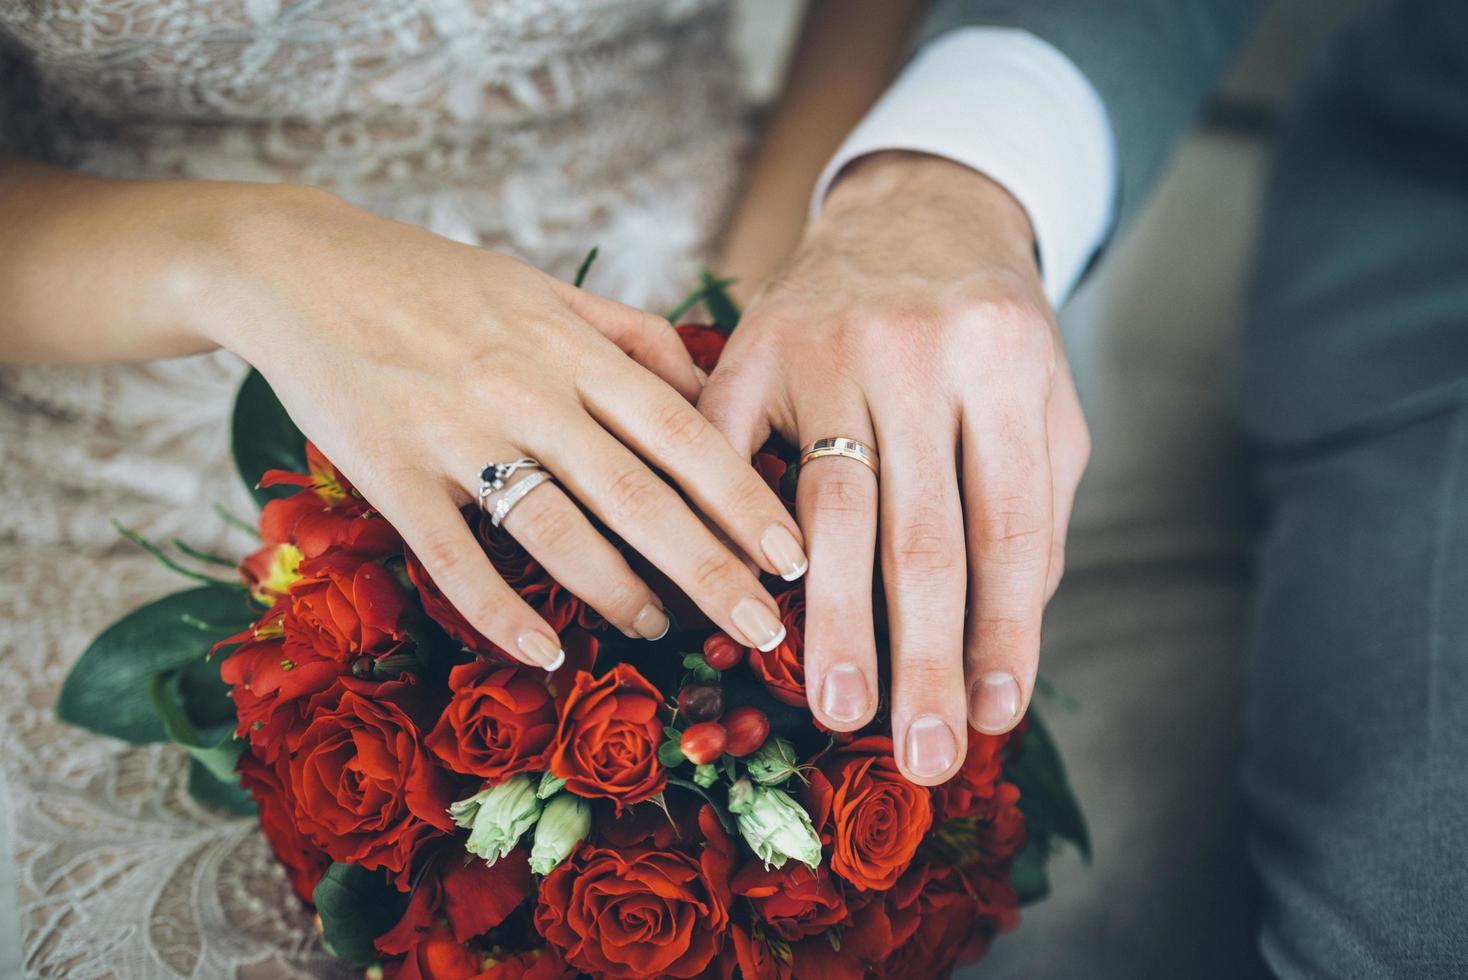 Braut Bräutigam mit rotem Blumenstrauß foto